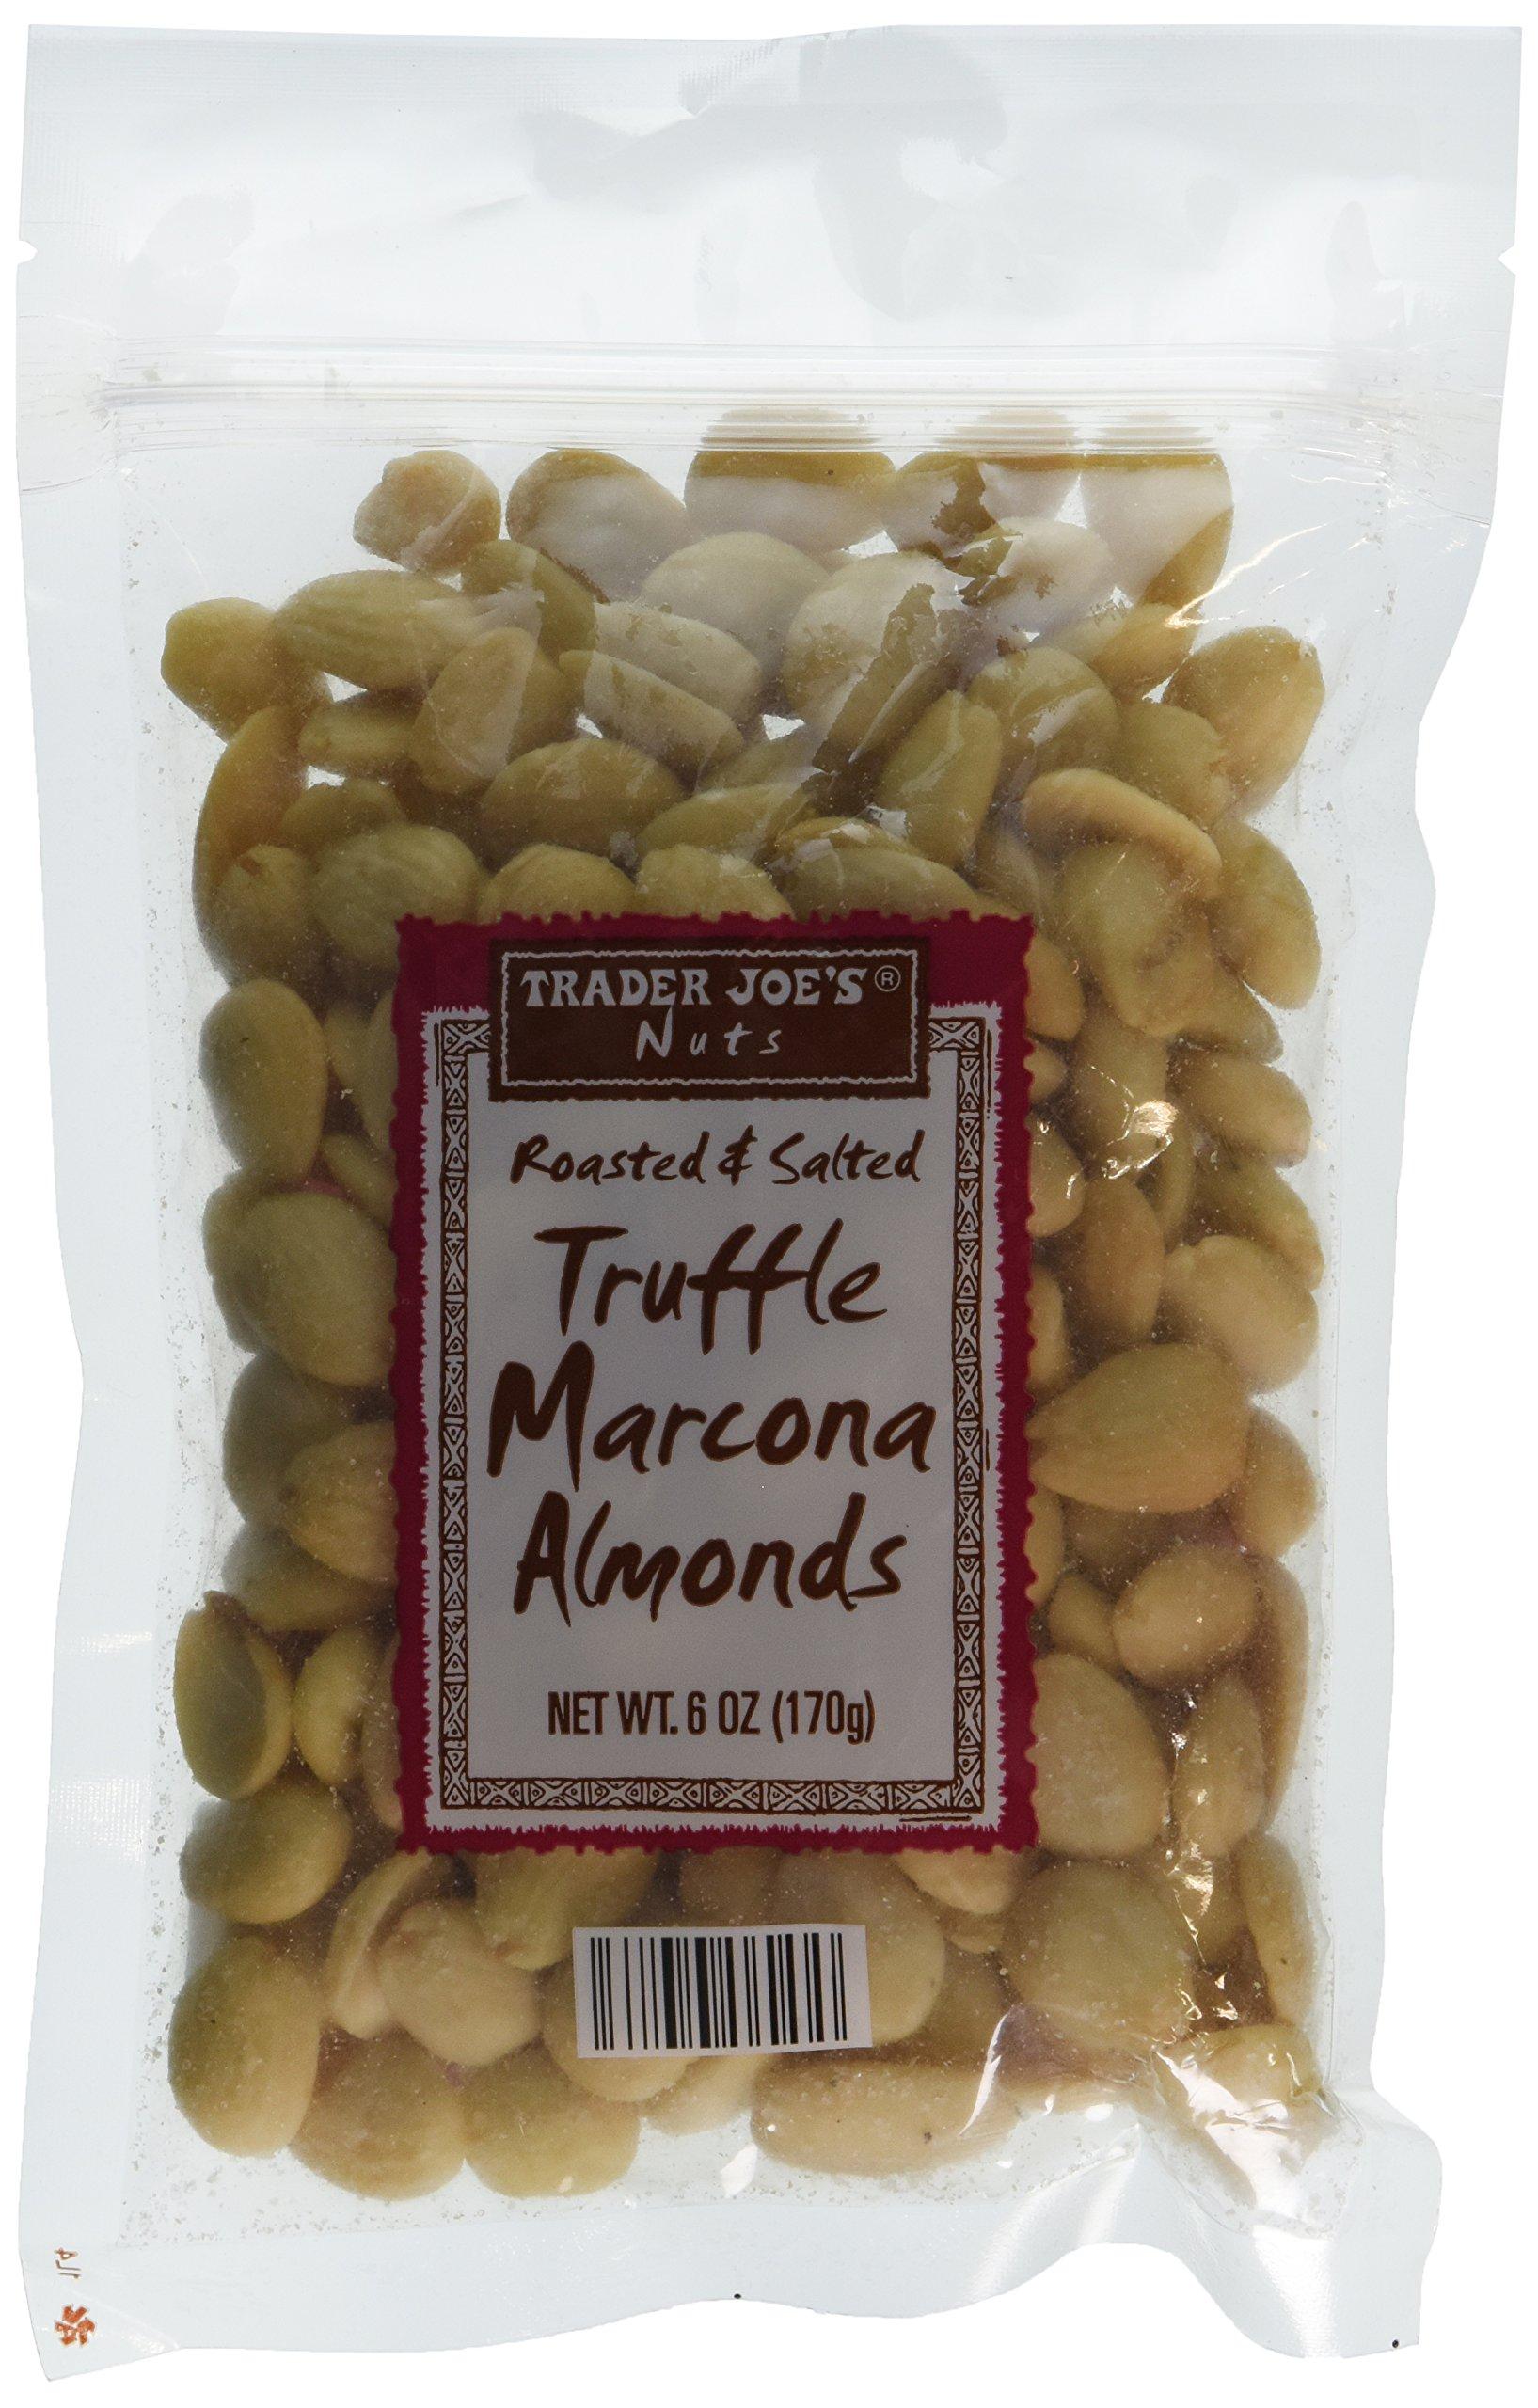 Trader Joe's Roasted & Salted Truffle Marcona Almonds